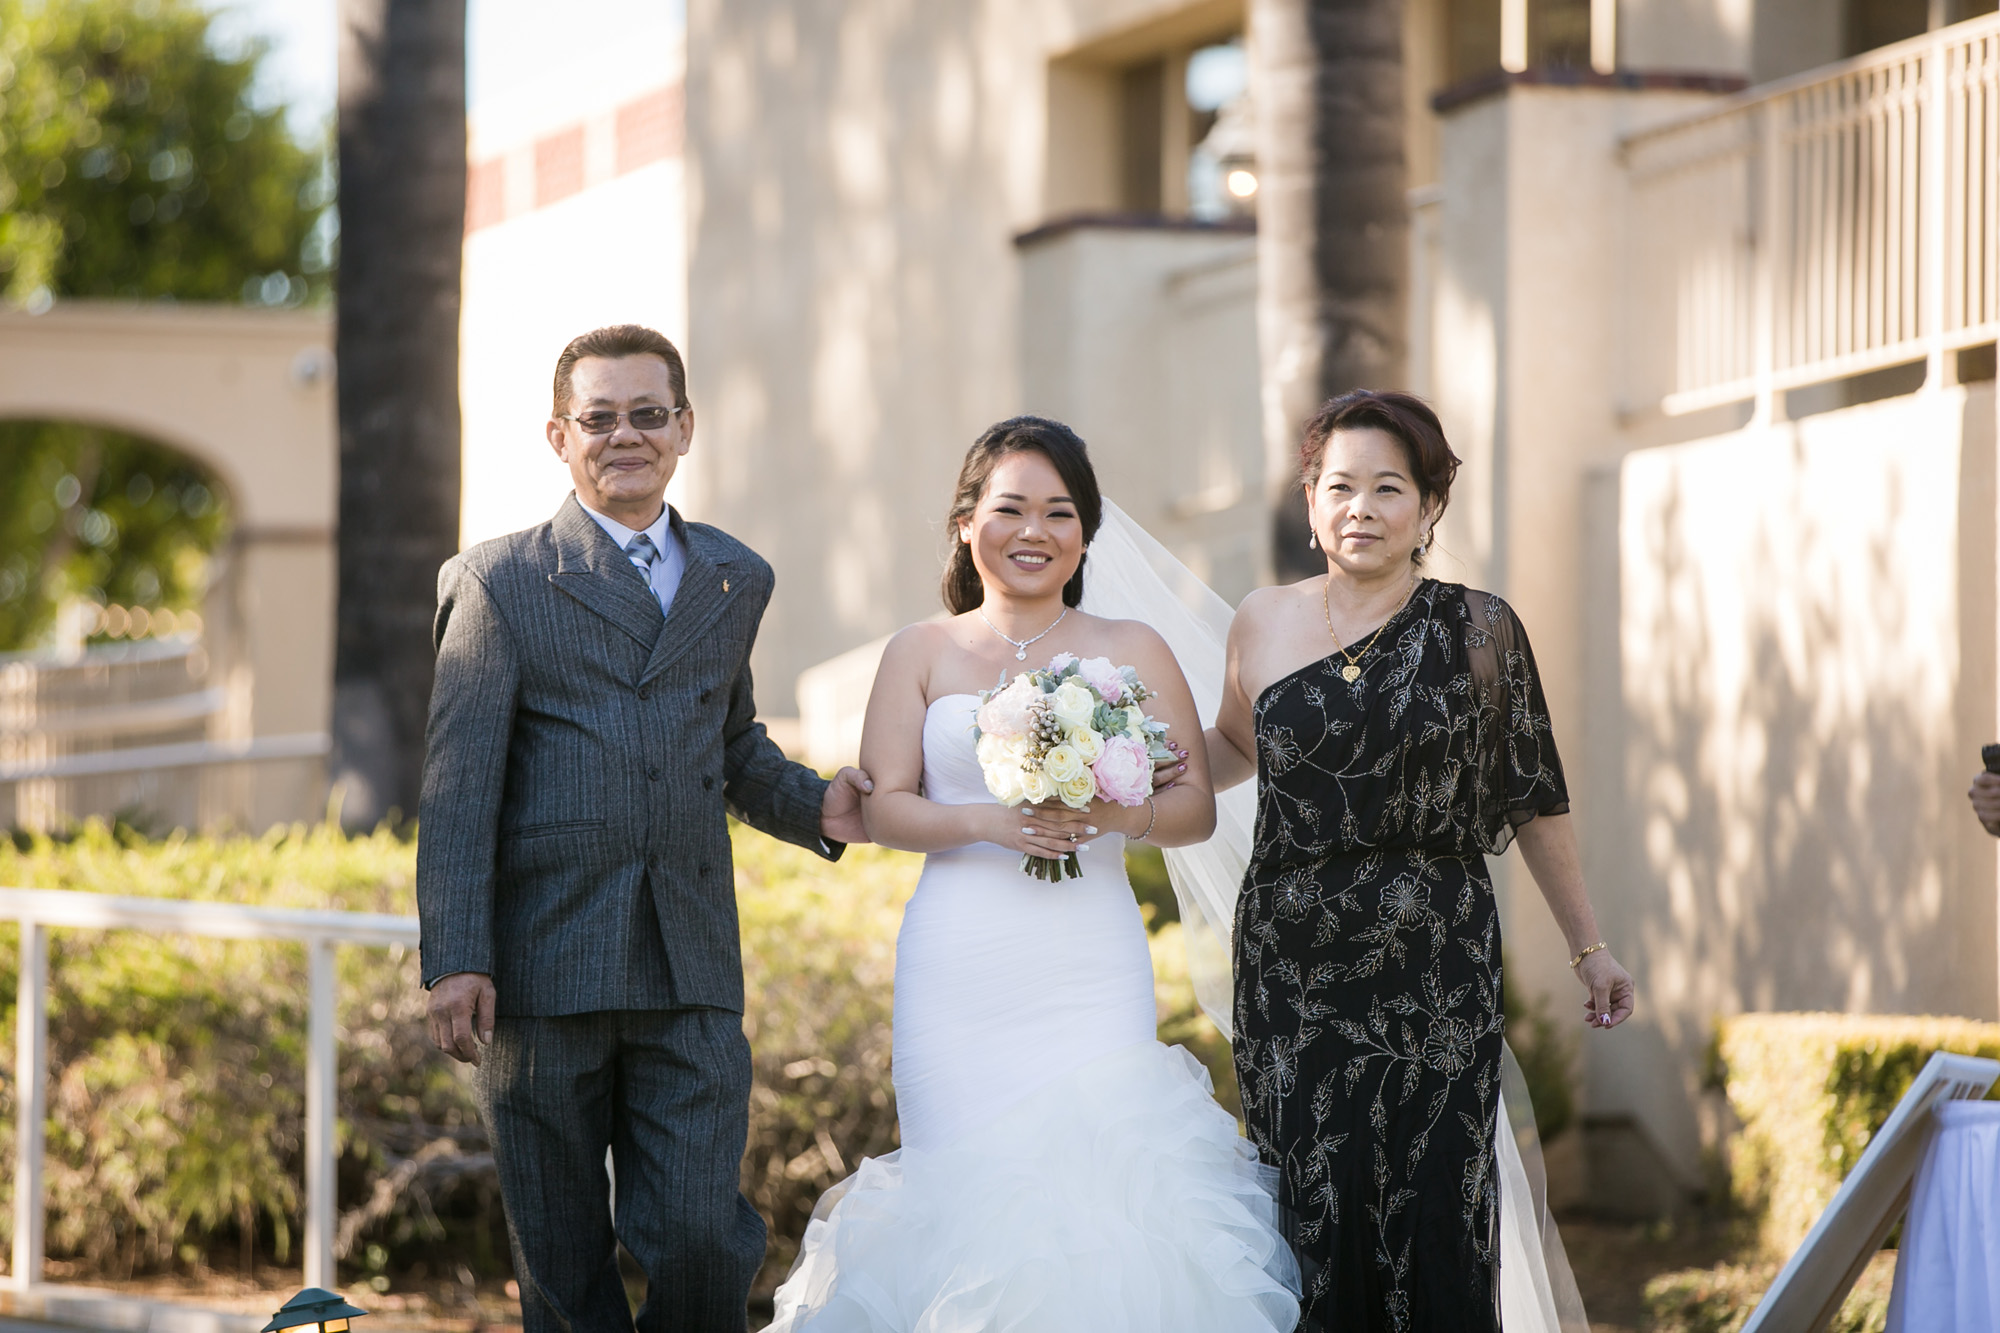 Geoff Kowalchuk JT Wedding Photo-011.jpg